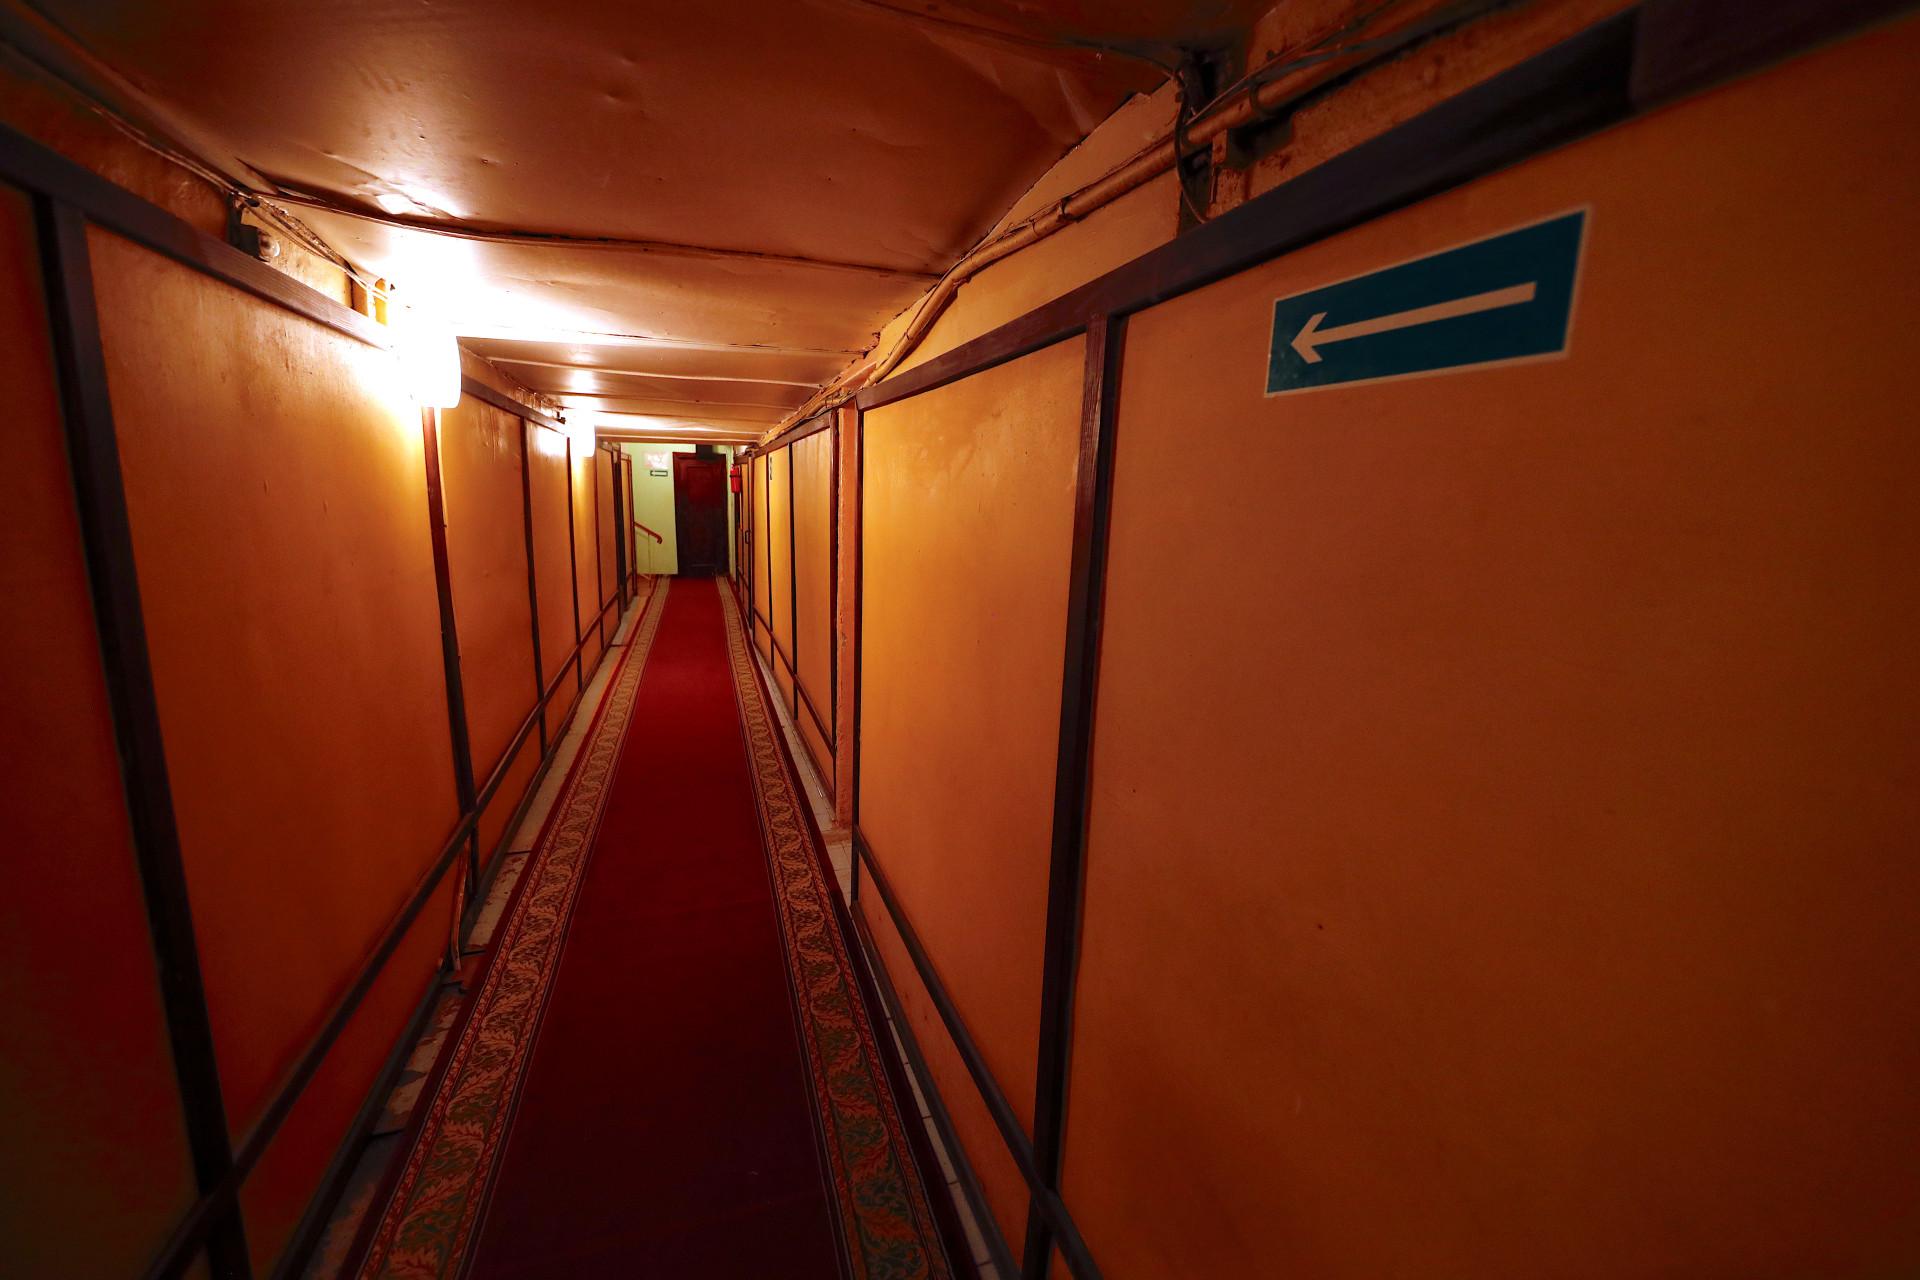 O bunker secreto de Estaline na Segunda Guerra Mundial